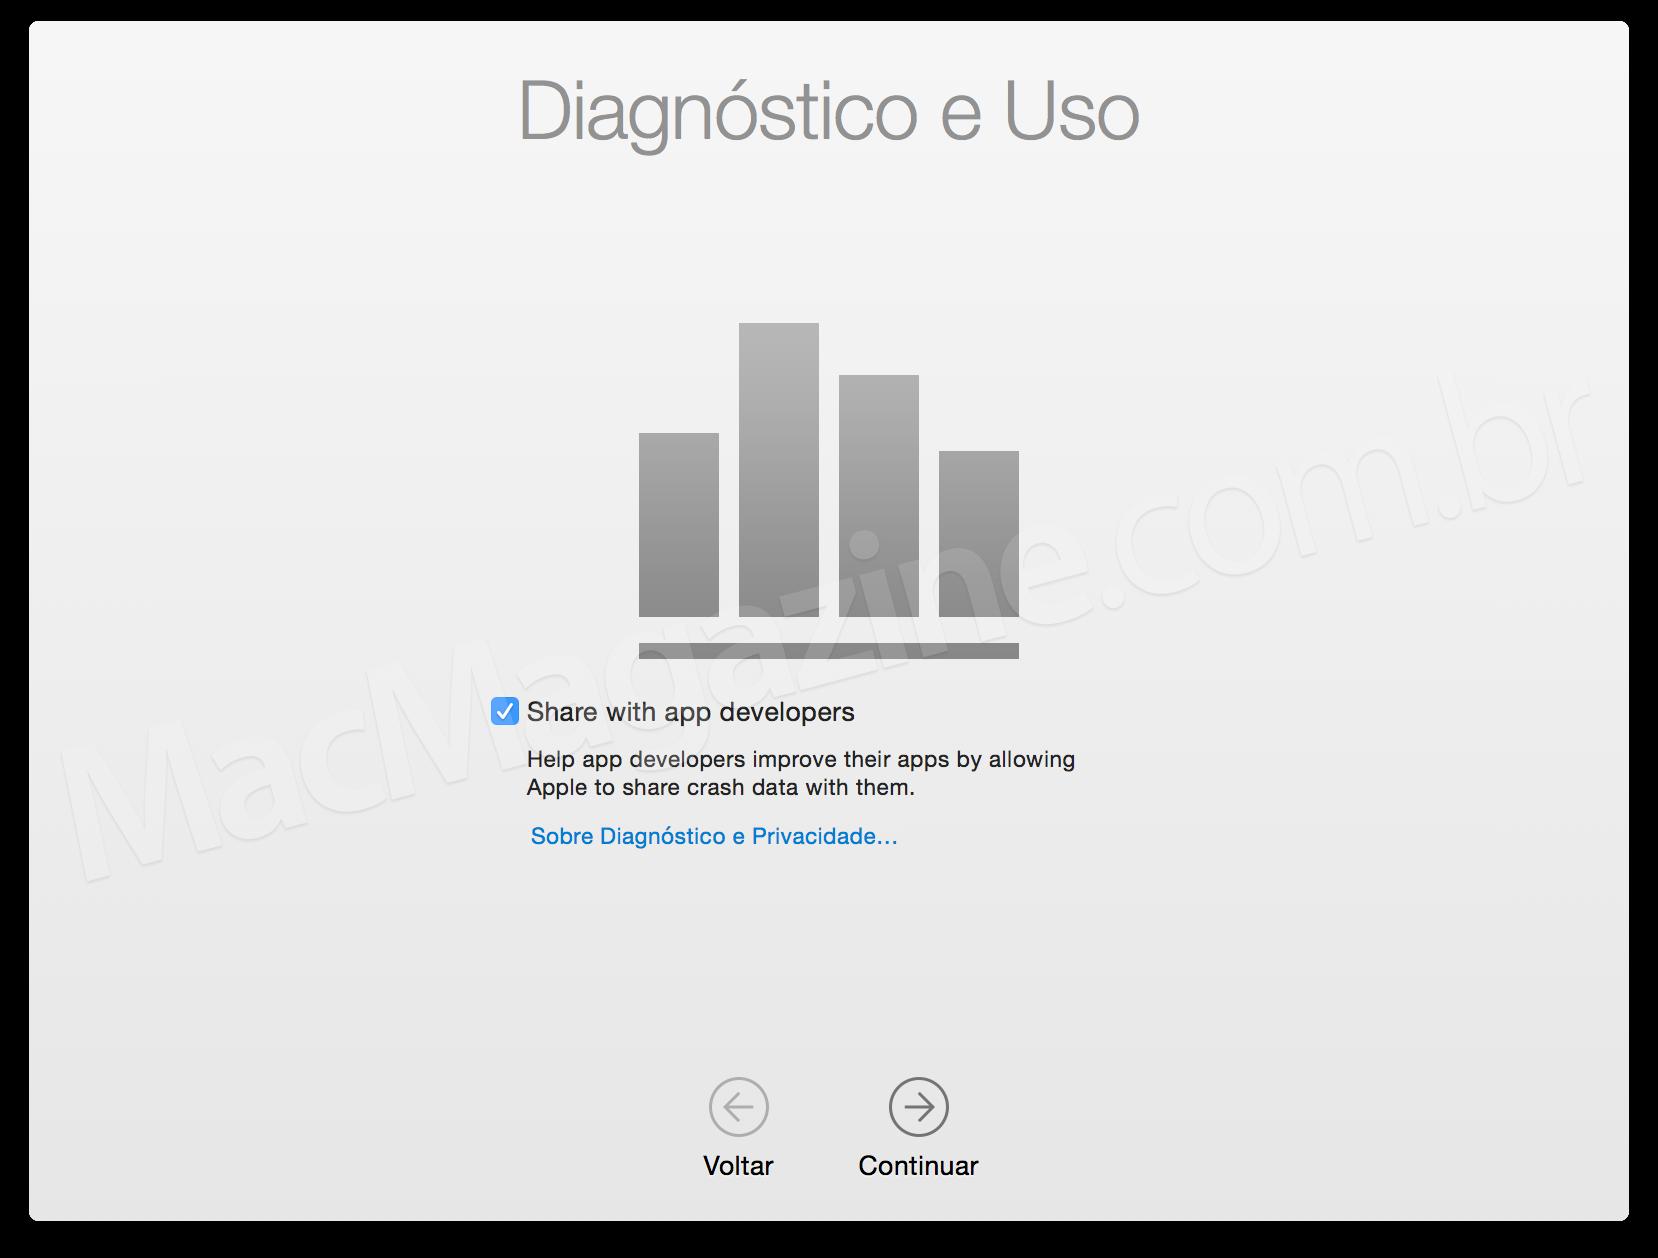 Diagnóstico e uso